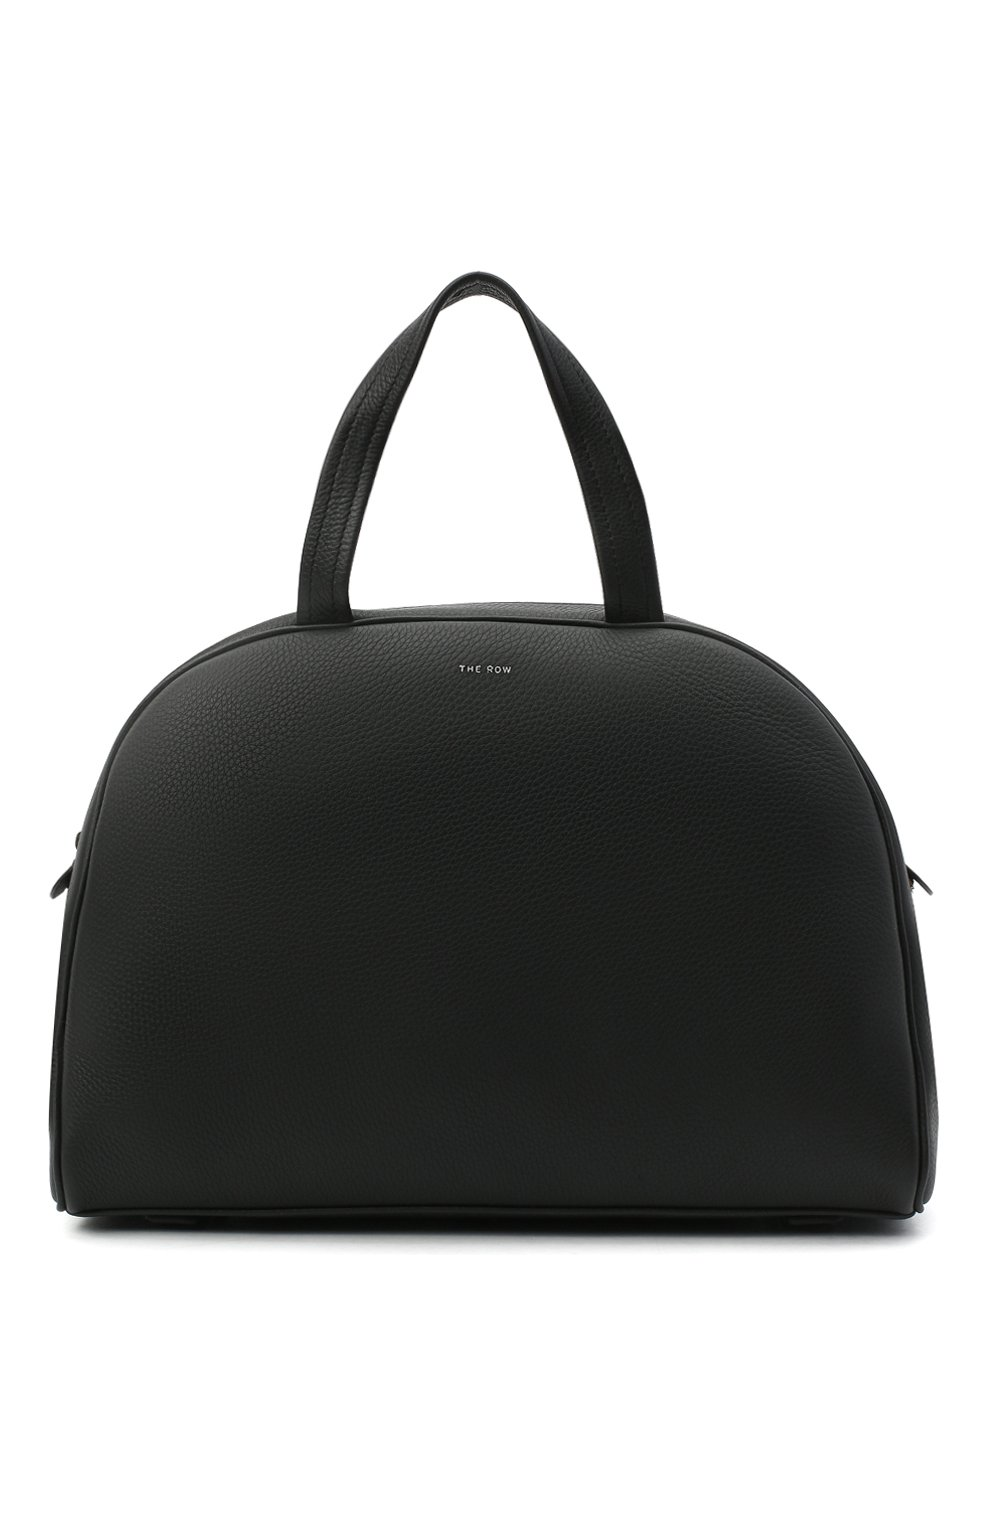 Женская сумка THE ROW черного цвета, арт. W1261L129 | Фото 1